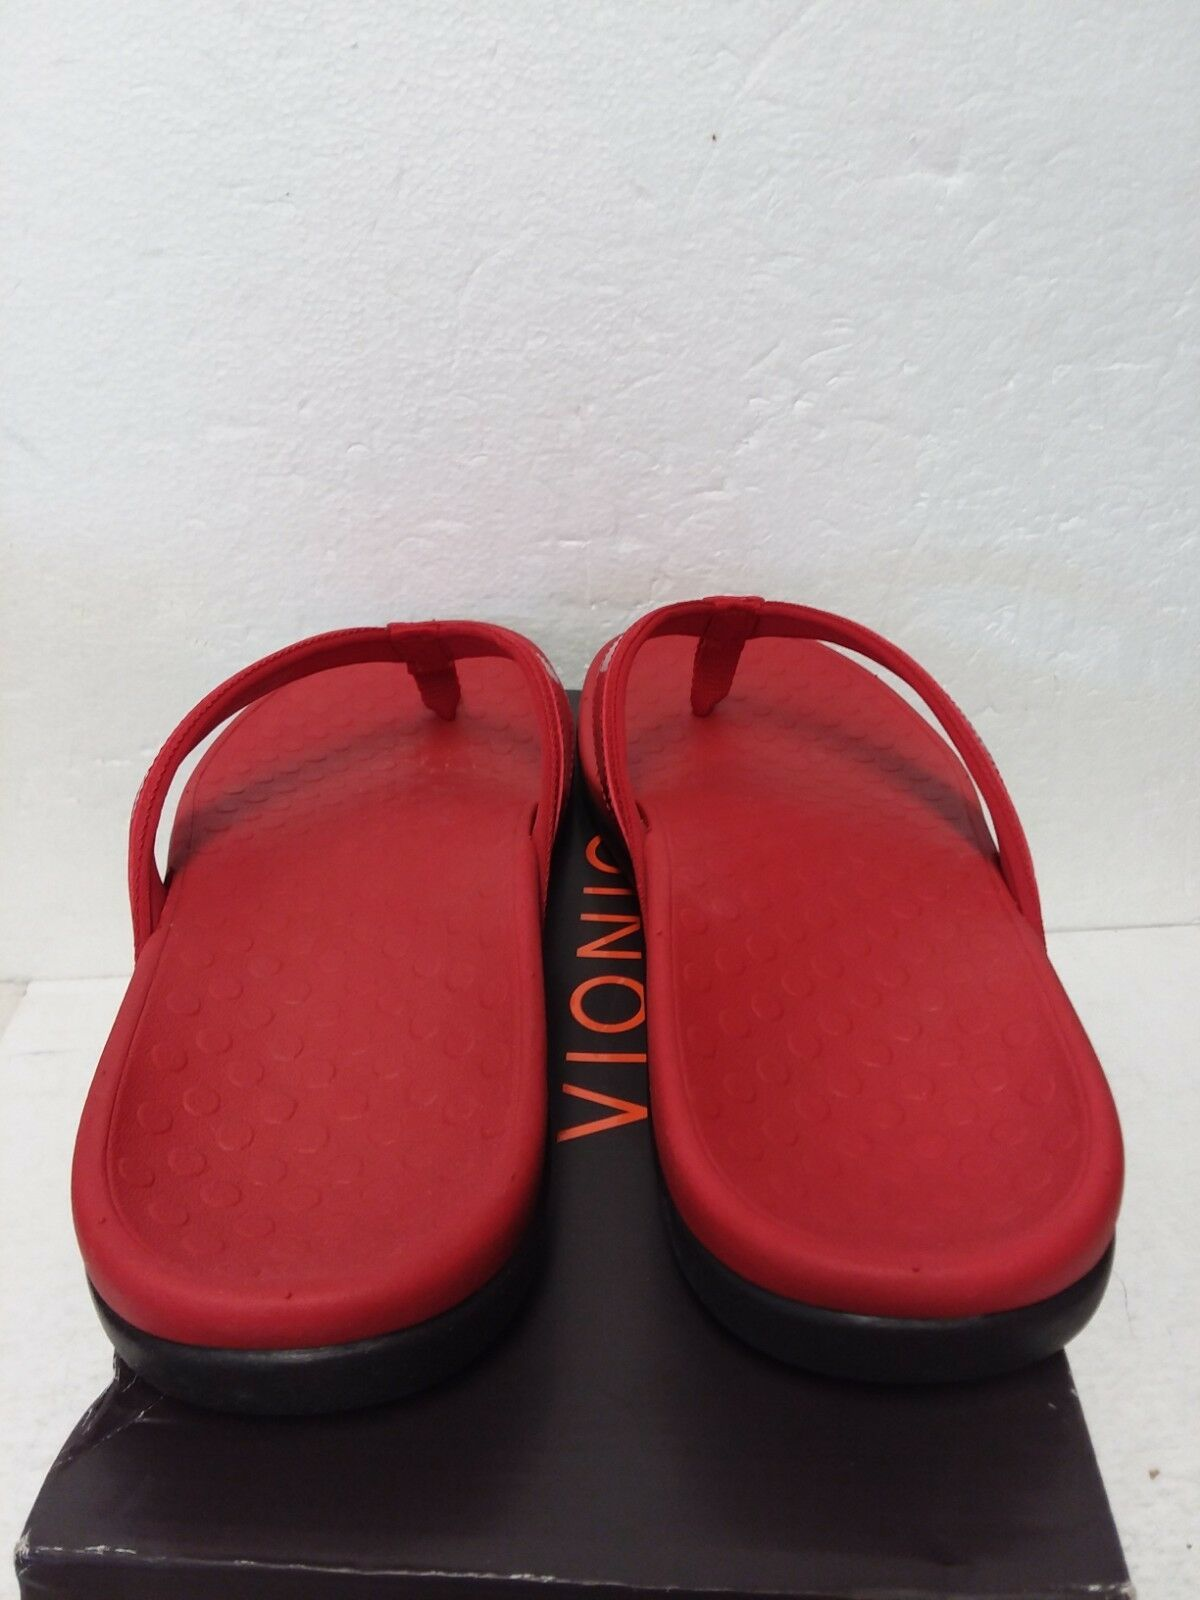 Vionic Womens Tide II Sandals, Lightweight Flexible Durable, Orthaheel Red 11